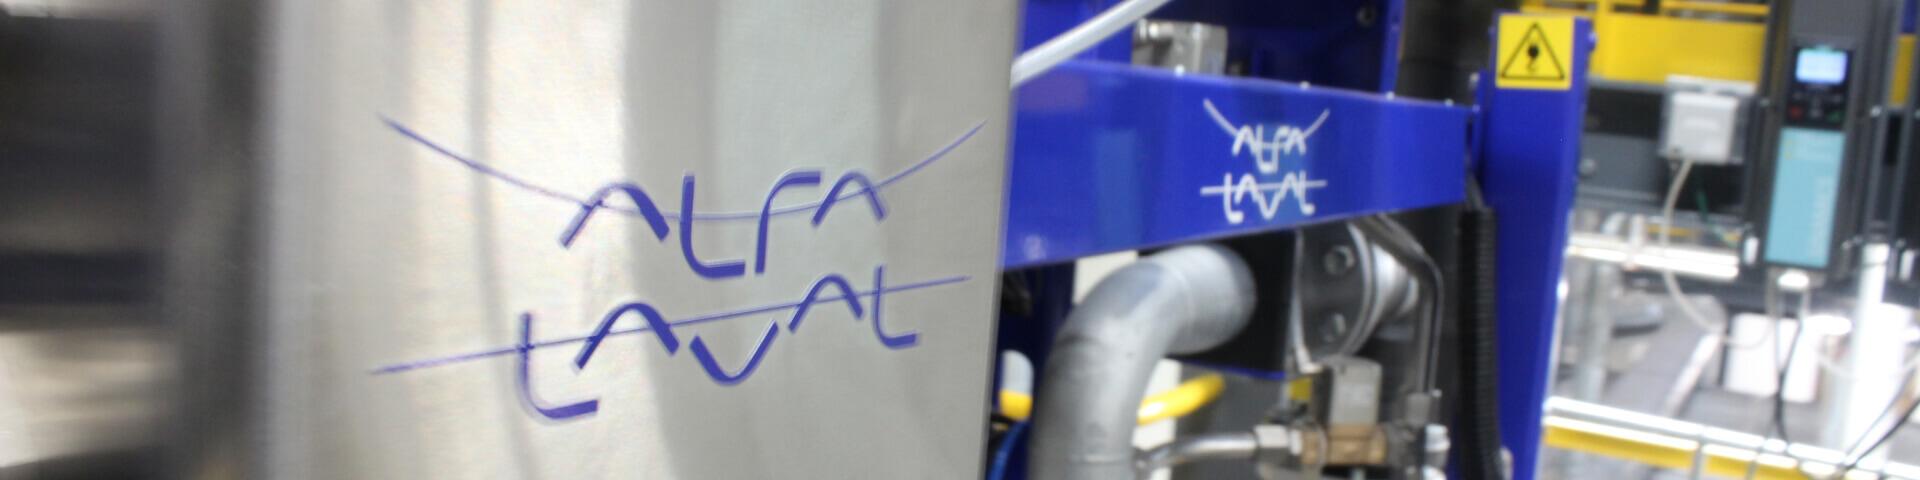 Ballast water system - System hero banner